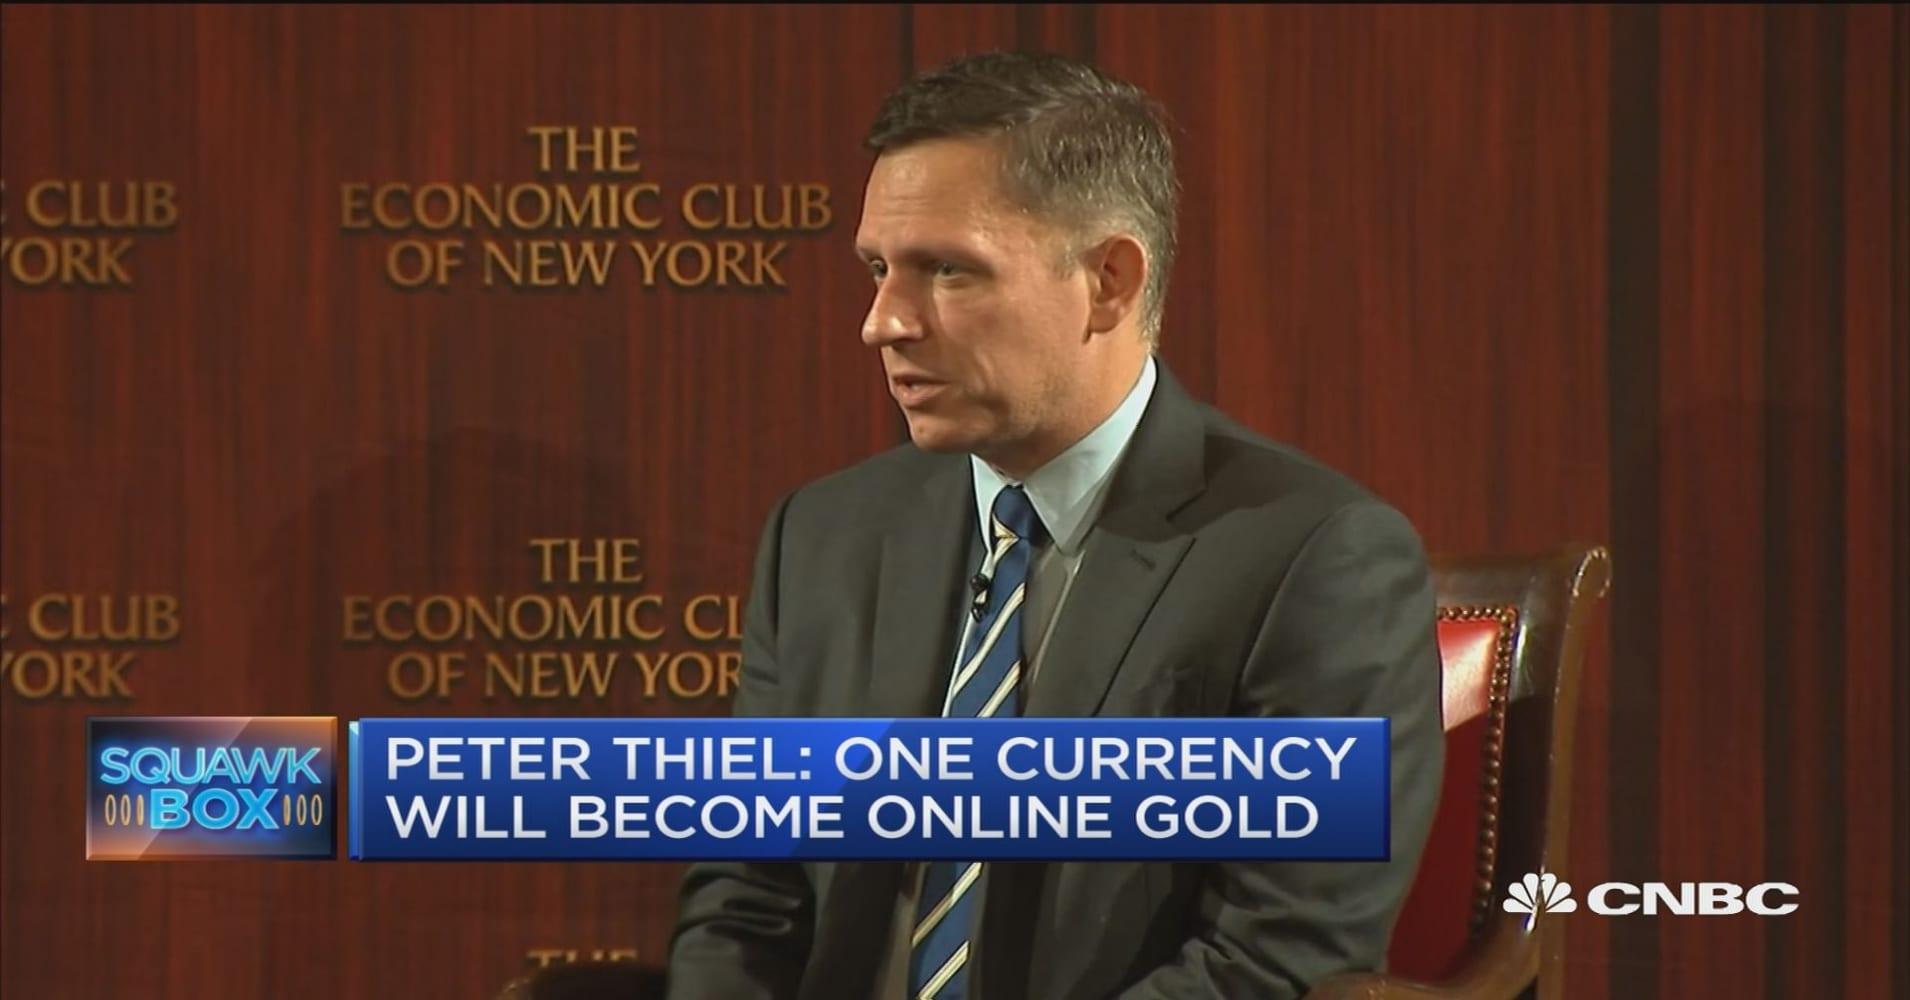 Billionaire tech investor Peter Thiel betting on bitcoin